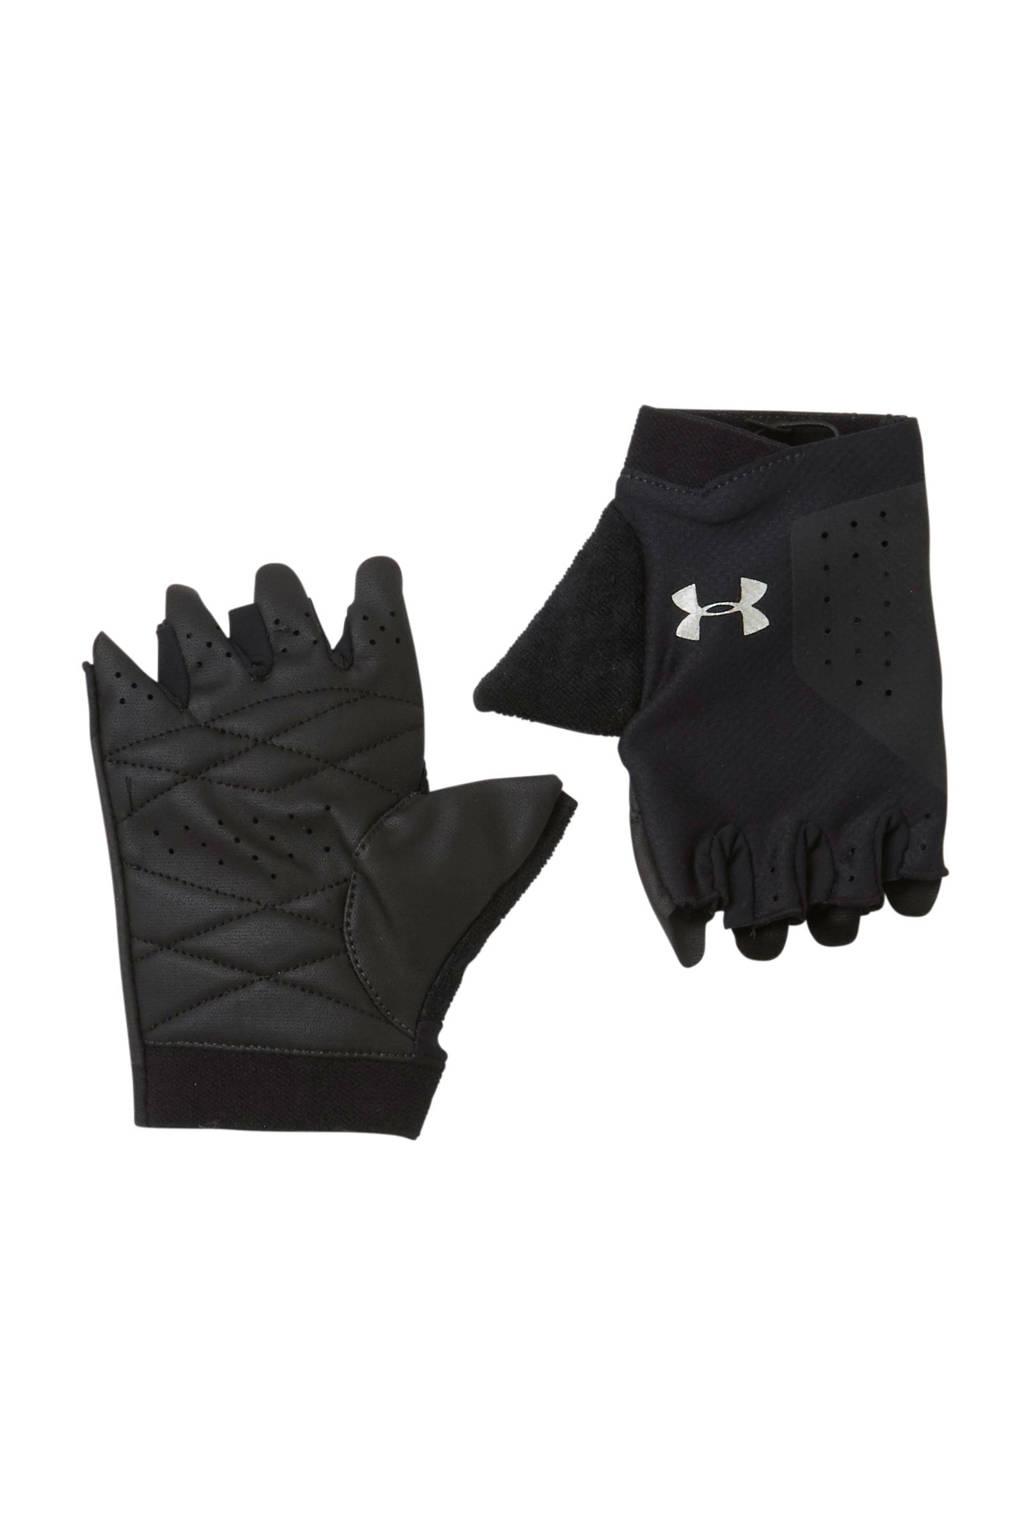 Under Armour  sporthandschoenen zwart